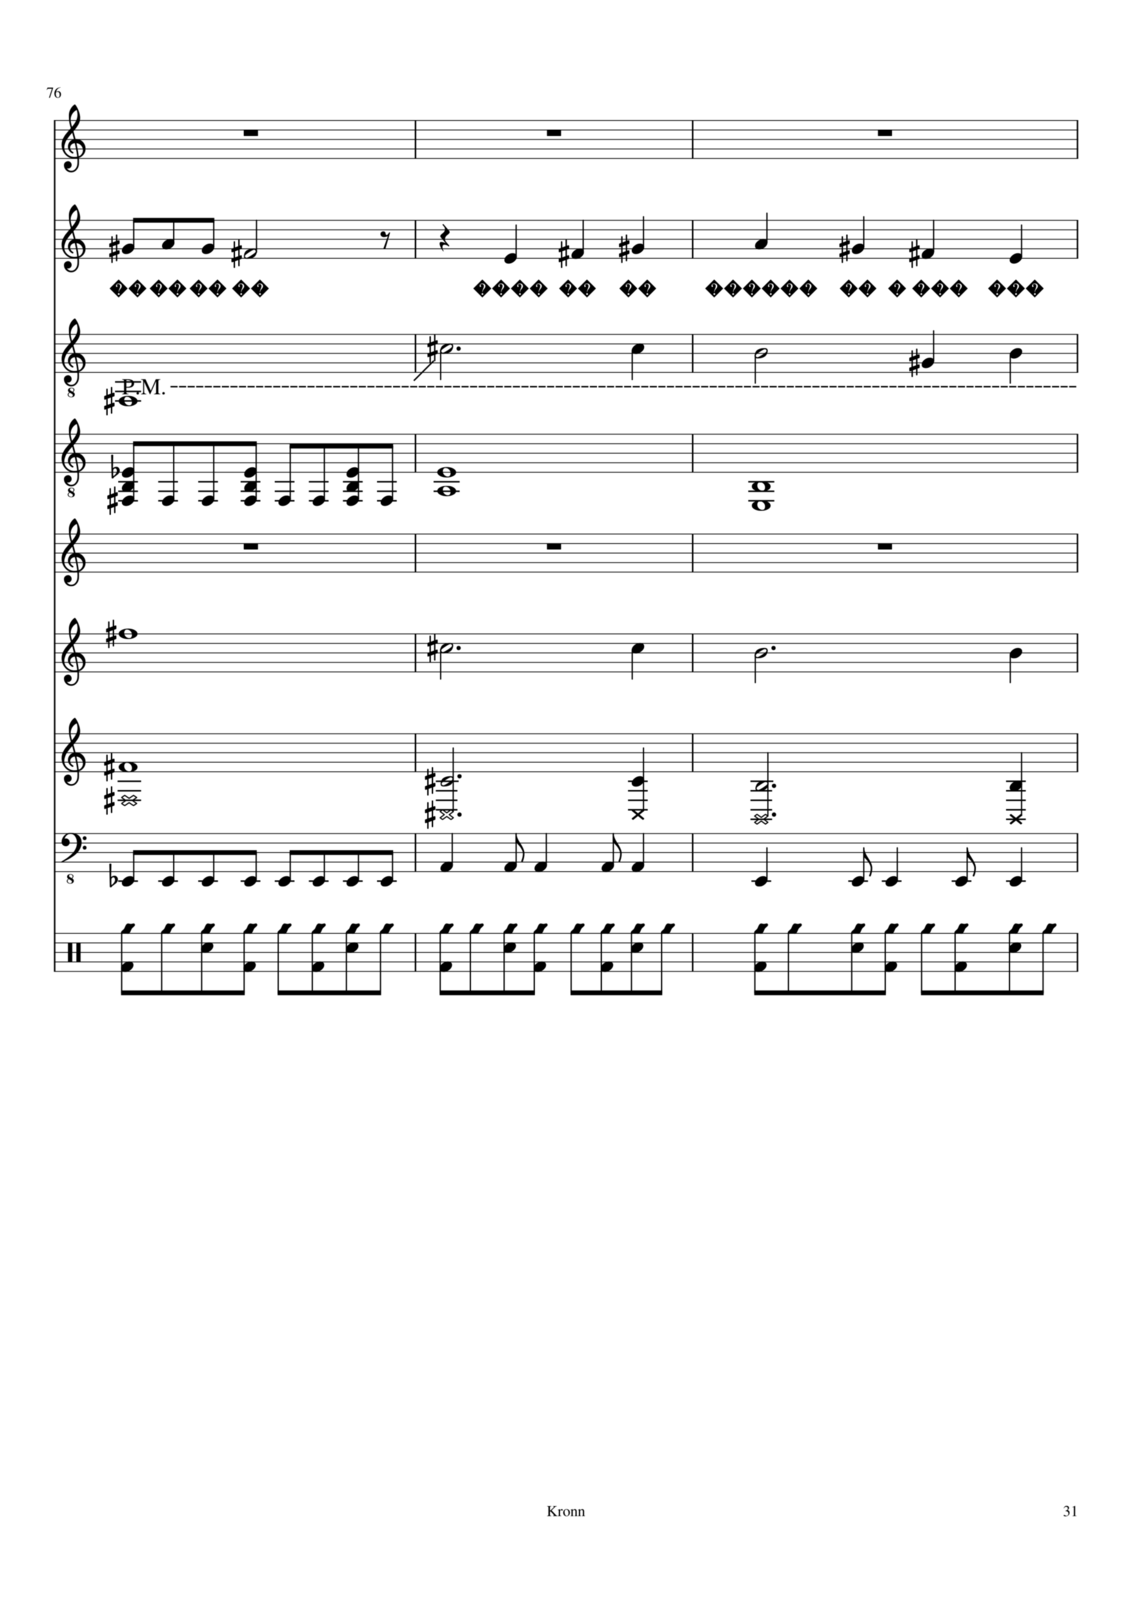 Ispoved Pervogo Boga slide, Image 31